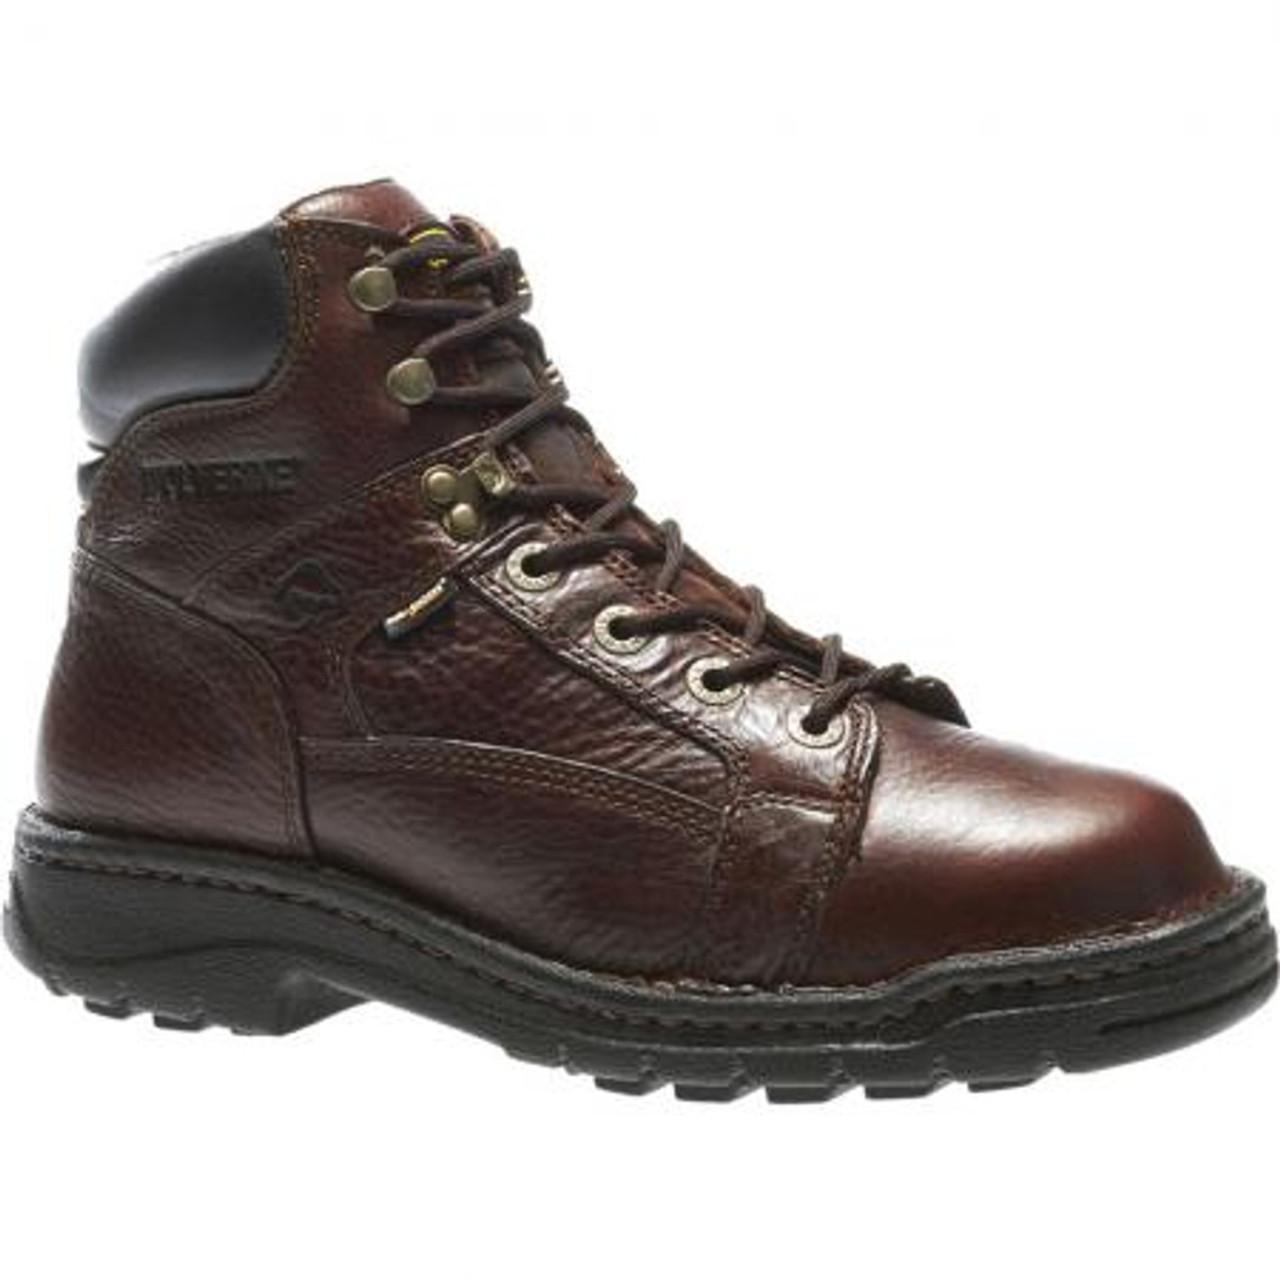 c7262a921 Wolverine W04378 Mens Exert Durashocks Opanka 6 Inch Work Boot ...